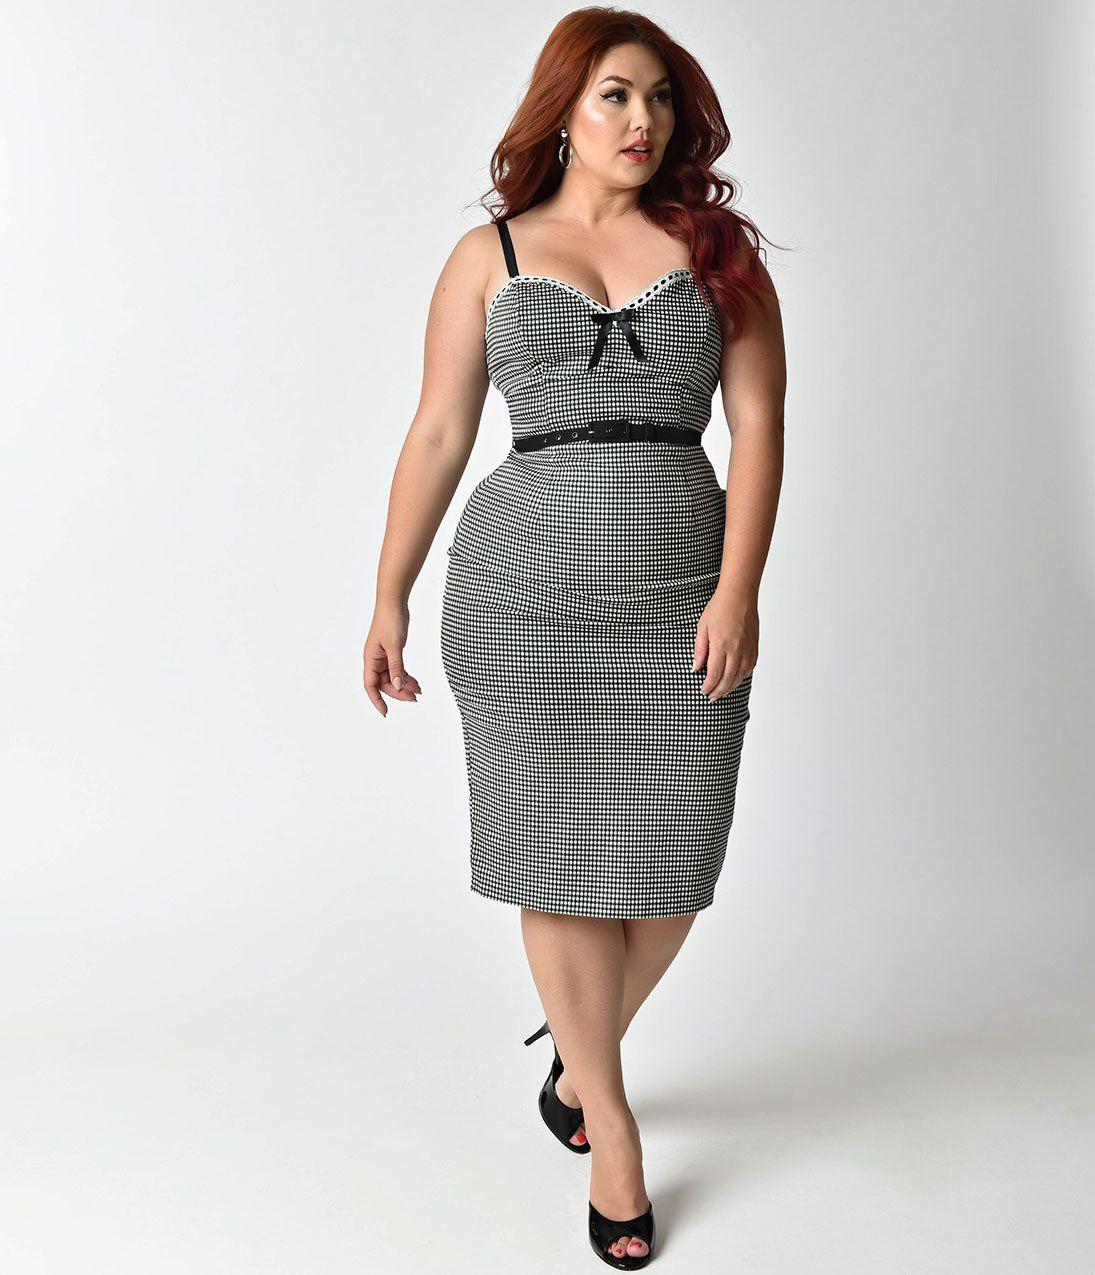 0531e7817bc Micheline Pitt For Unique Vintage Plus Size Black   White Gingham Lilli  Wiggle Dress